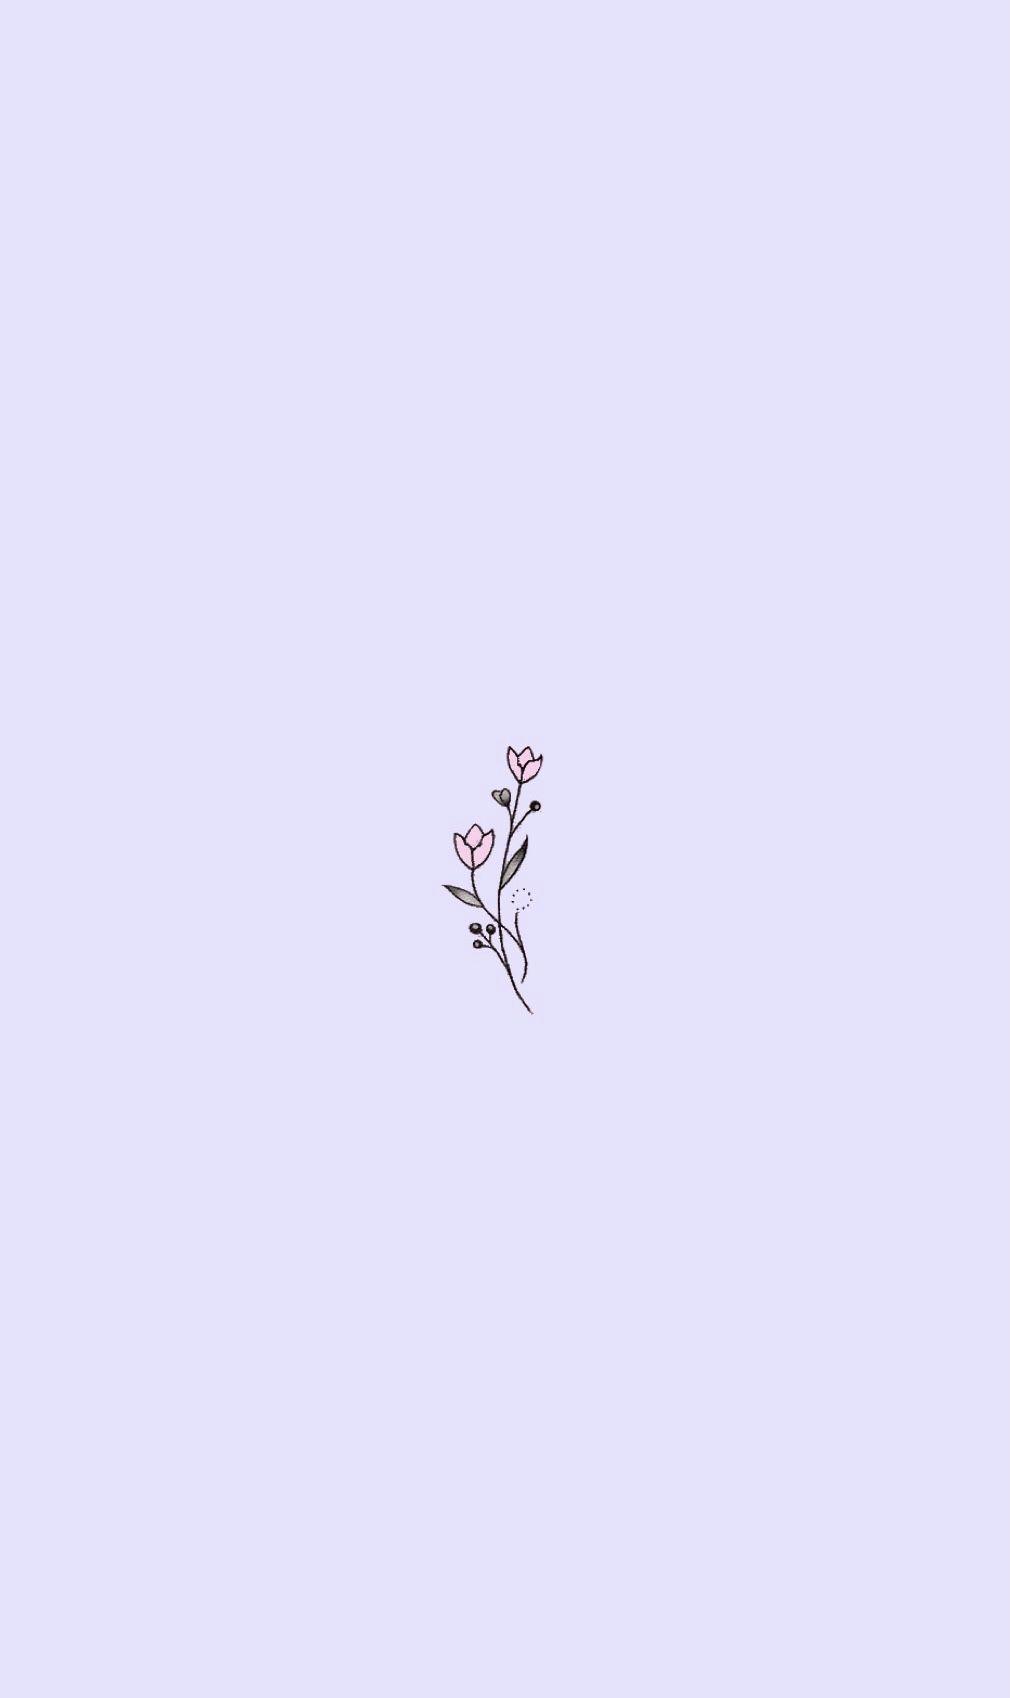 Pin By Vic Vianna On Meus Desenhos Cute Simple Wallpapers Wallpaper Iphone Cute Purple Wallpaper Iphone